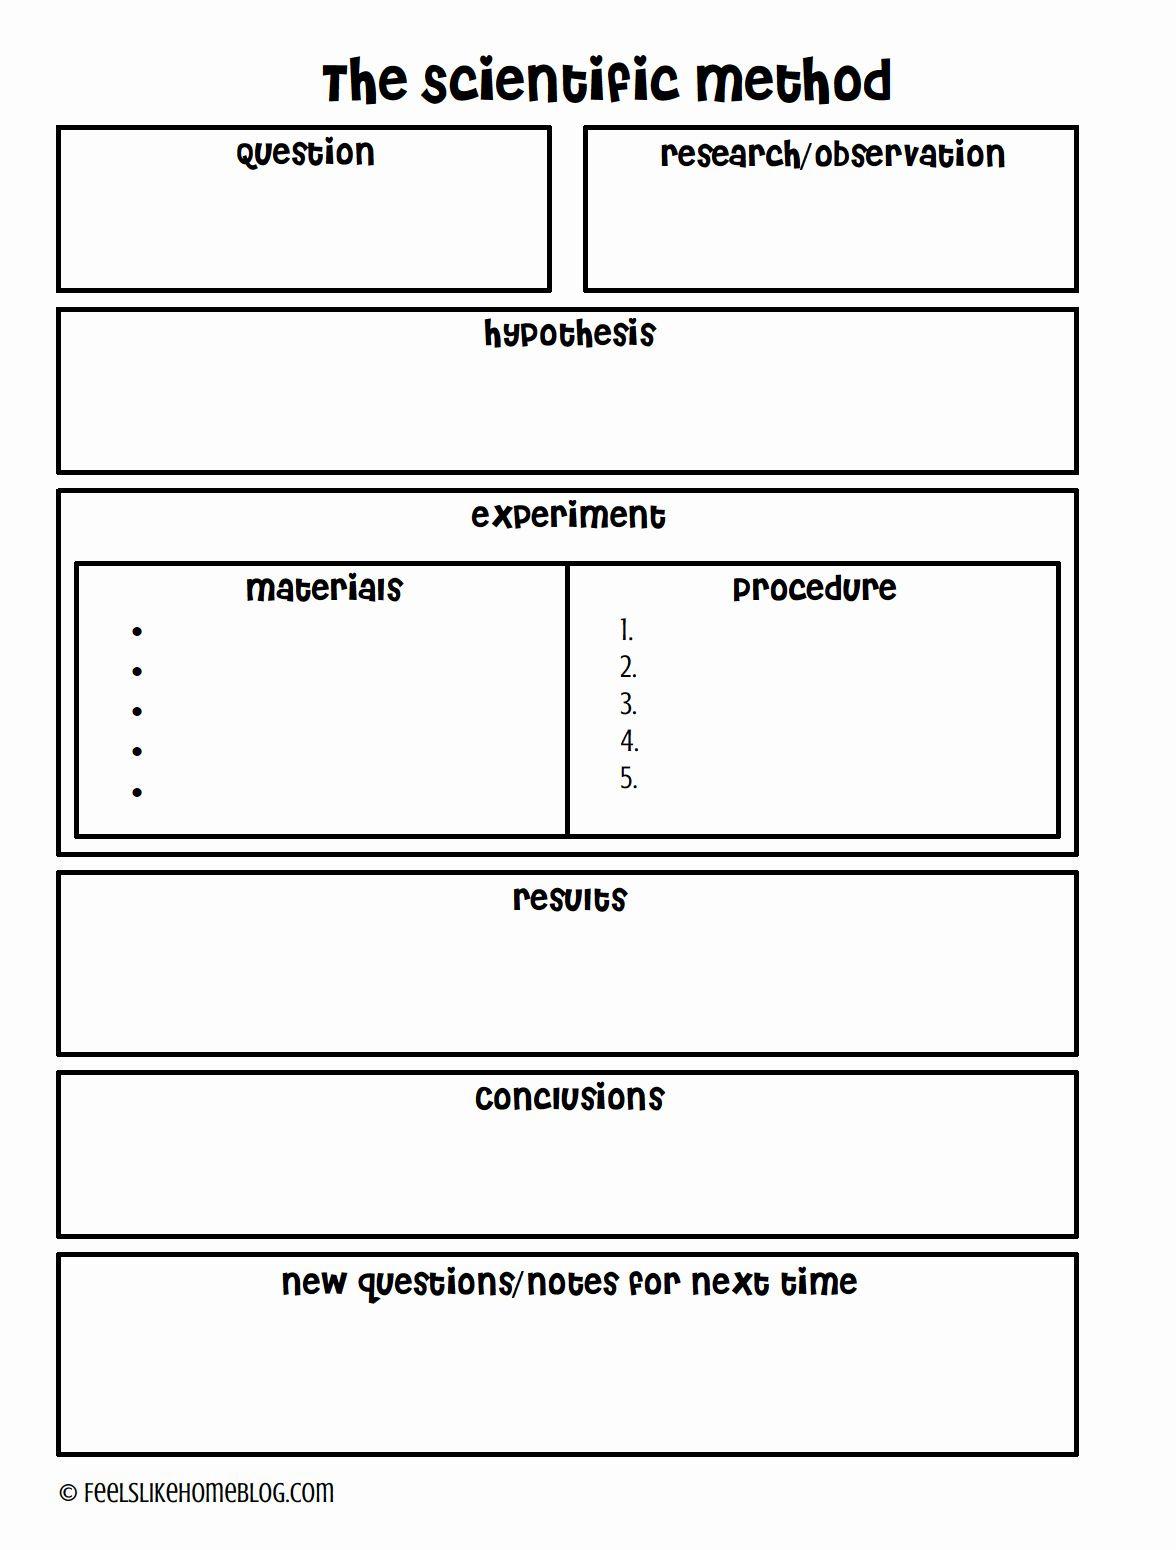 Scientific Method Examples Worksheet Unique Teaching The Scientific Met Teaching Scientific Method Scientific Method Free Printable Scientific Method Printable